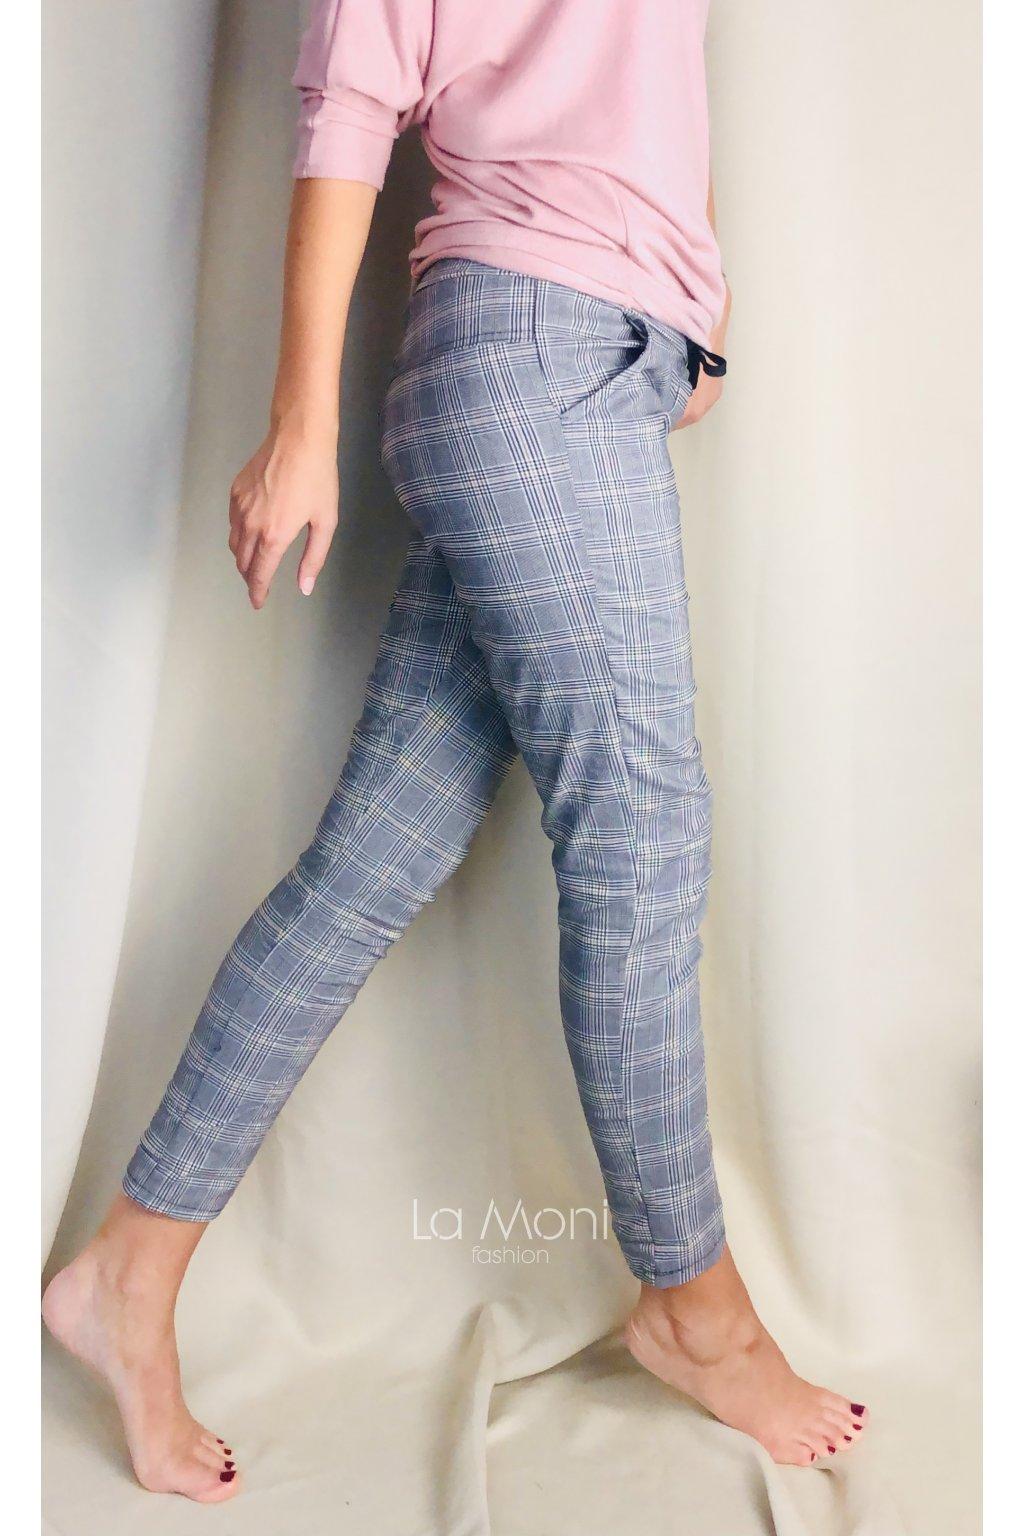 Strečové kalhoty   karo - více vzorů   vel. M